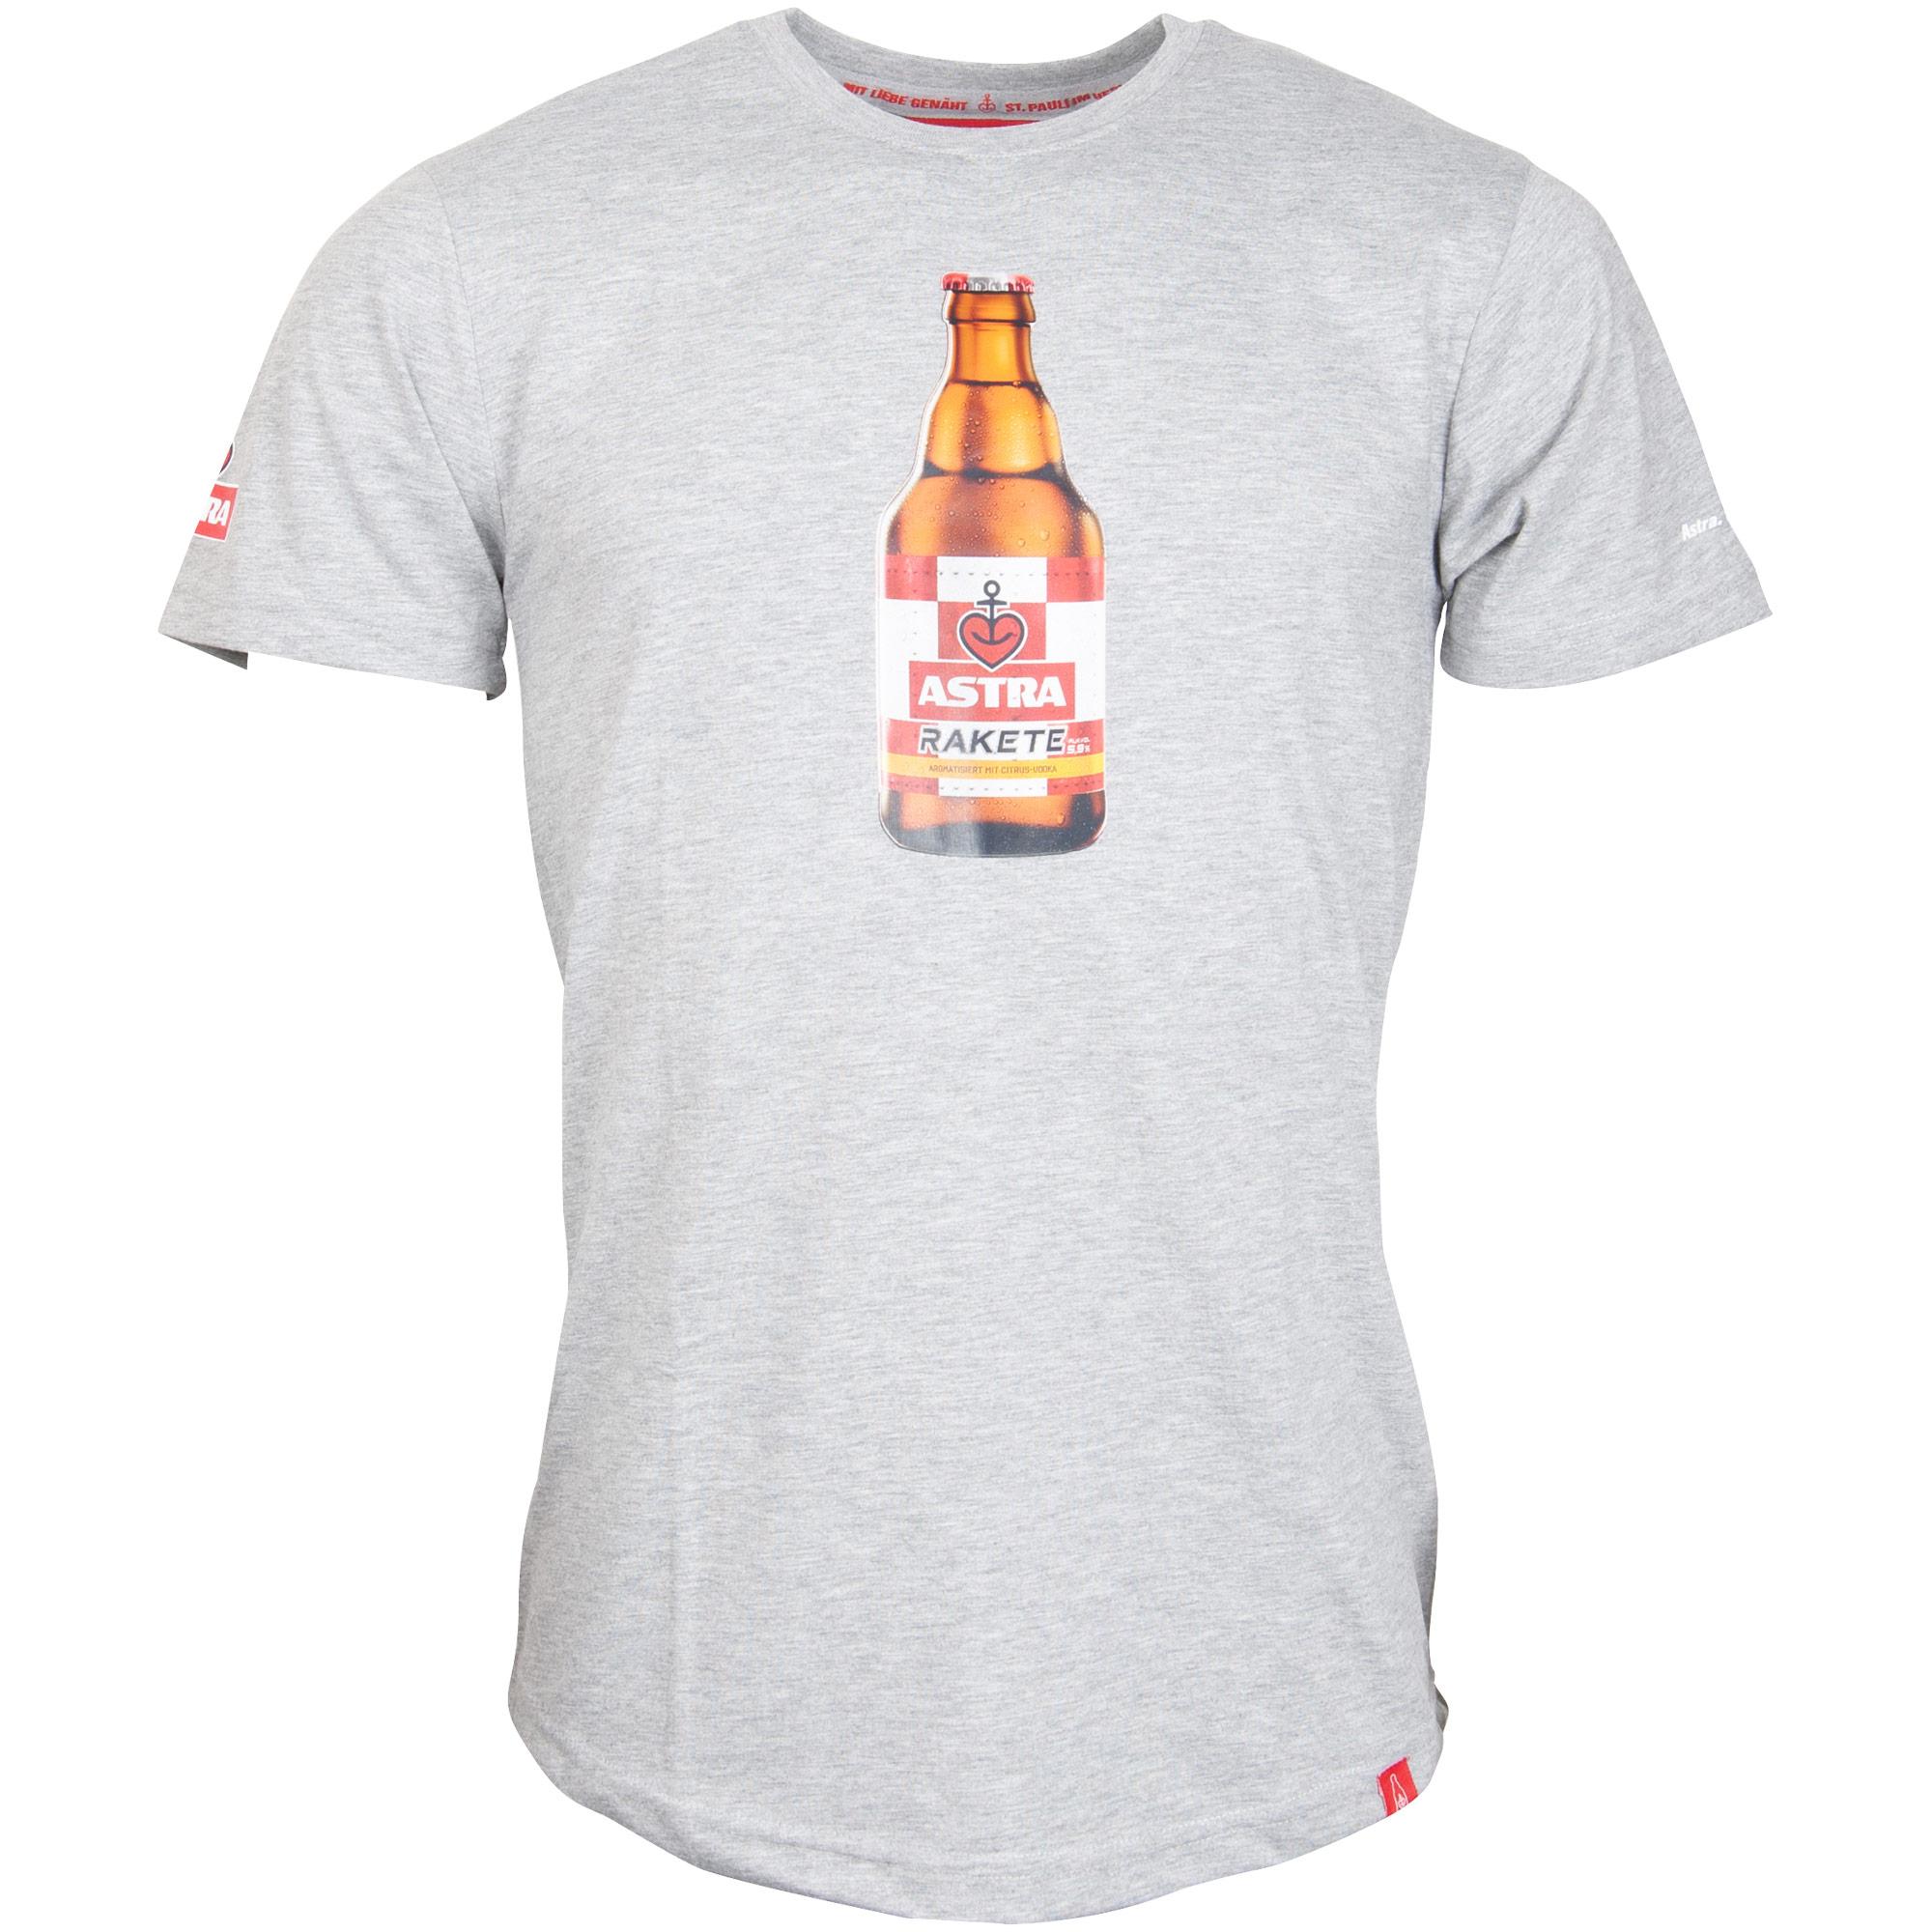 Astra - Herren T-Shirt Rakete Knolle - grau